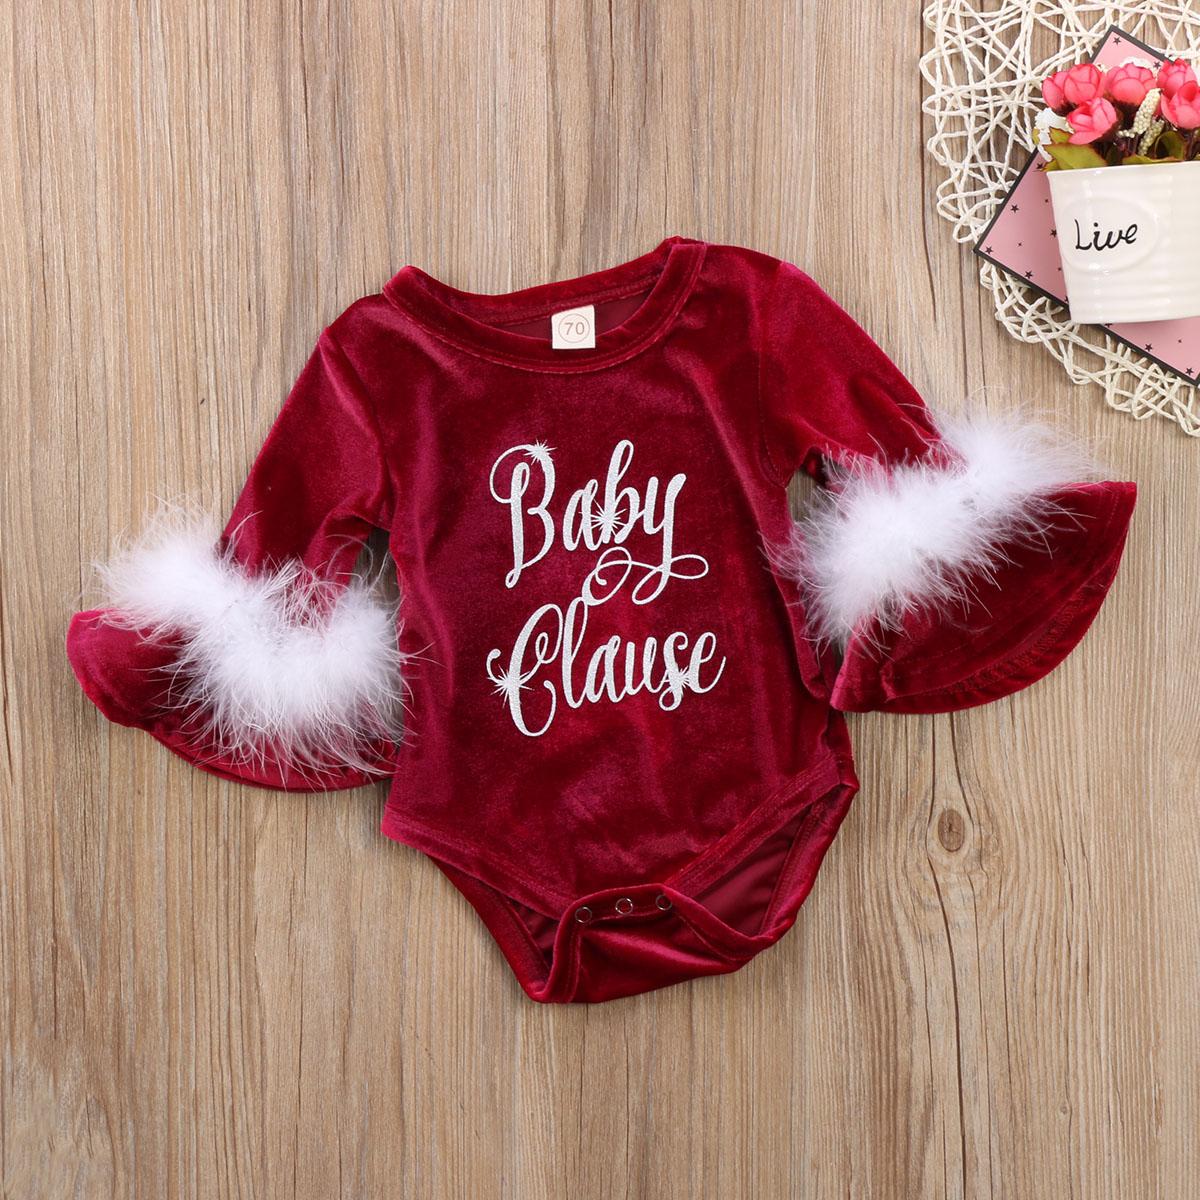 HTB1XDQVaval9eJjSZFzq6yITVXaF Pudcoco 2017 New Pleuche Christmas Baby Girls Romper long sleeves infant newborn baby jumpsuit princess plush clothes xmas gift